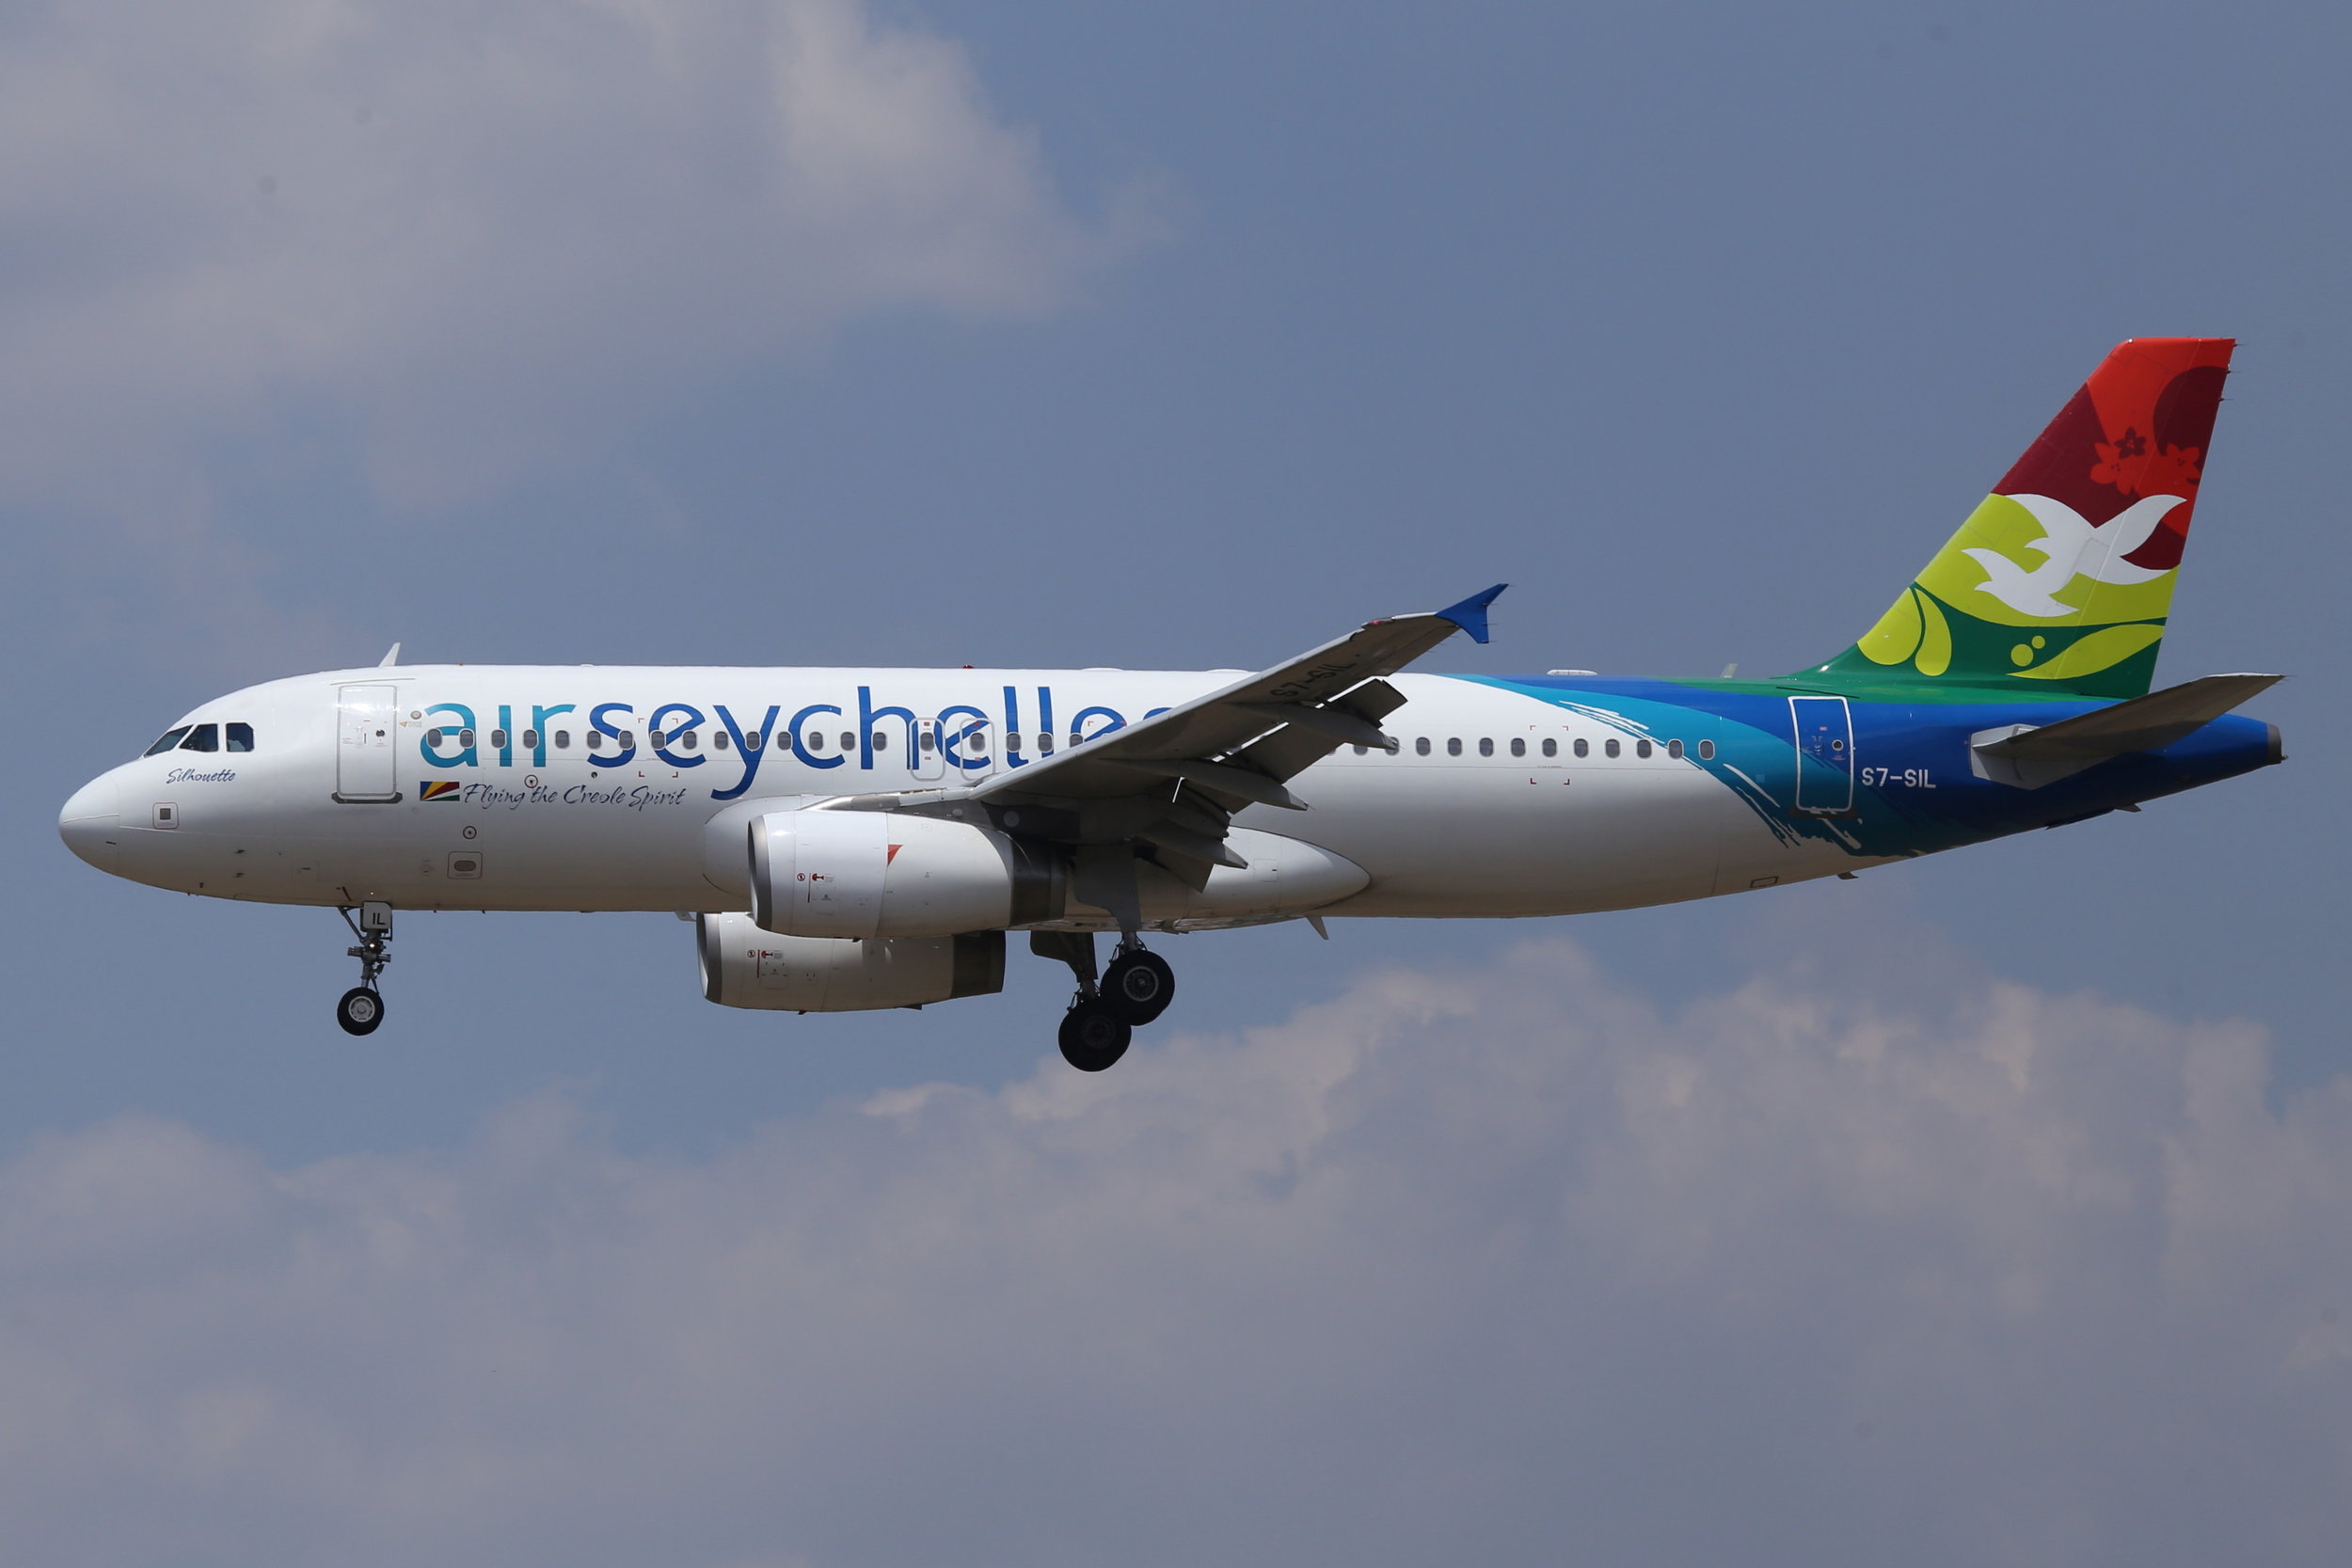 S7-SIL Air Seychelles A320 taken at Johannesburg 10th November 2018 by John Wood